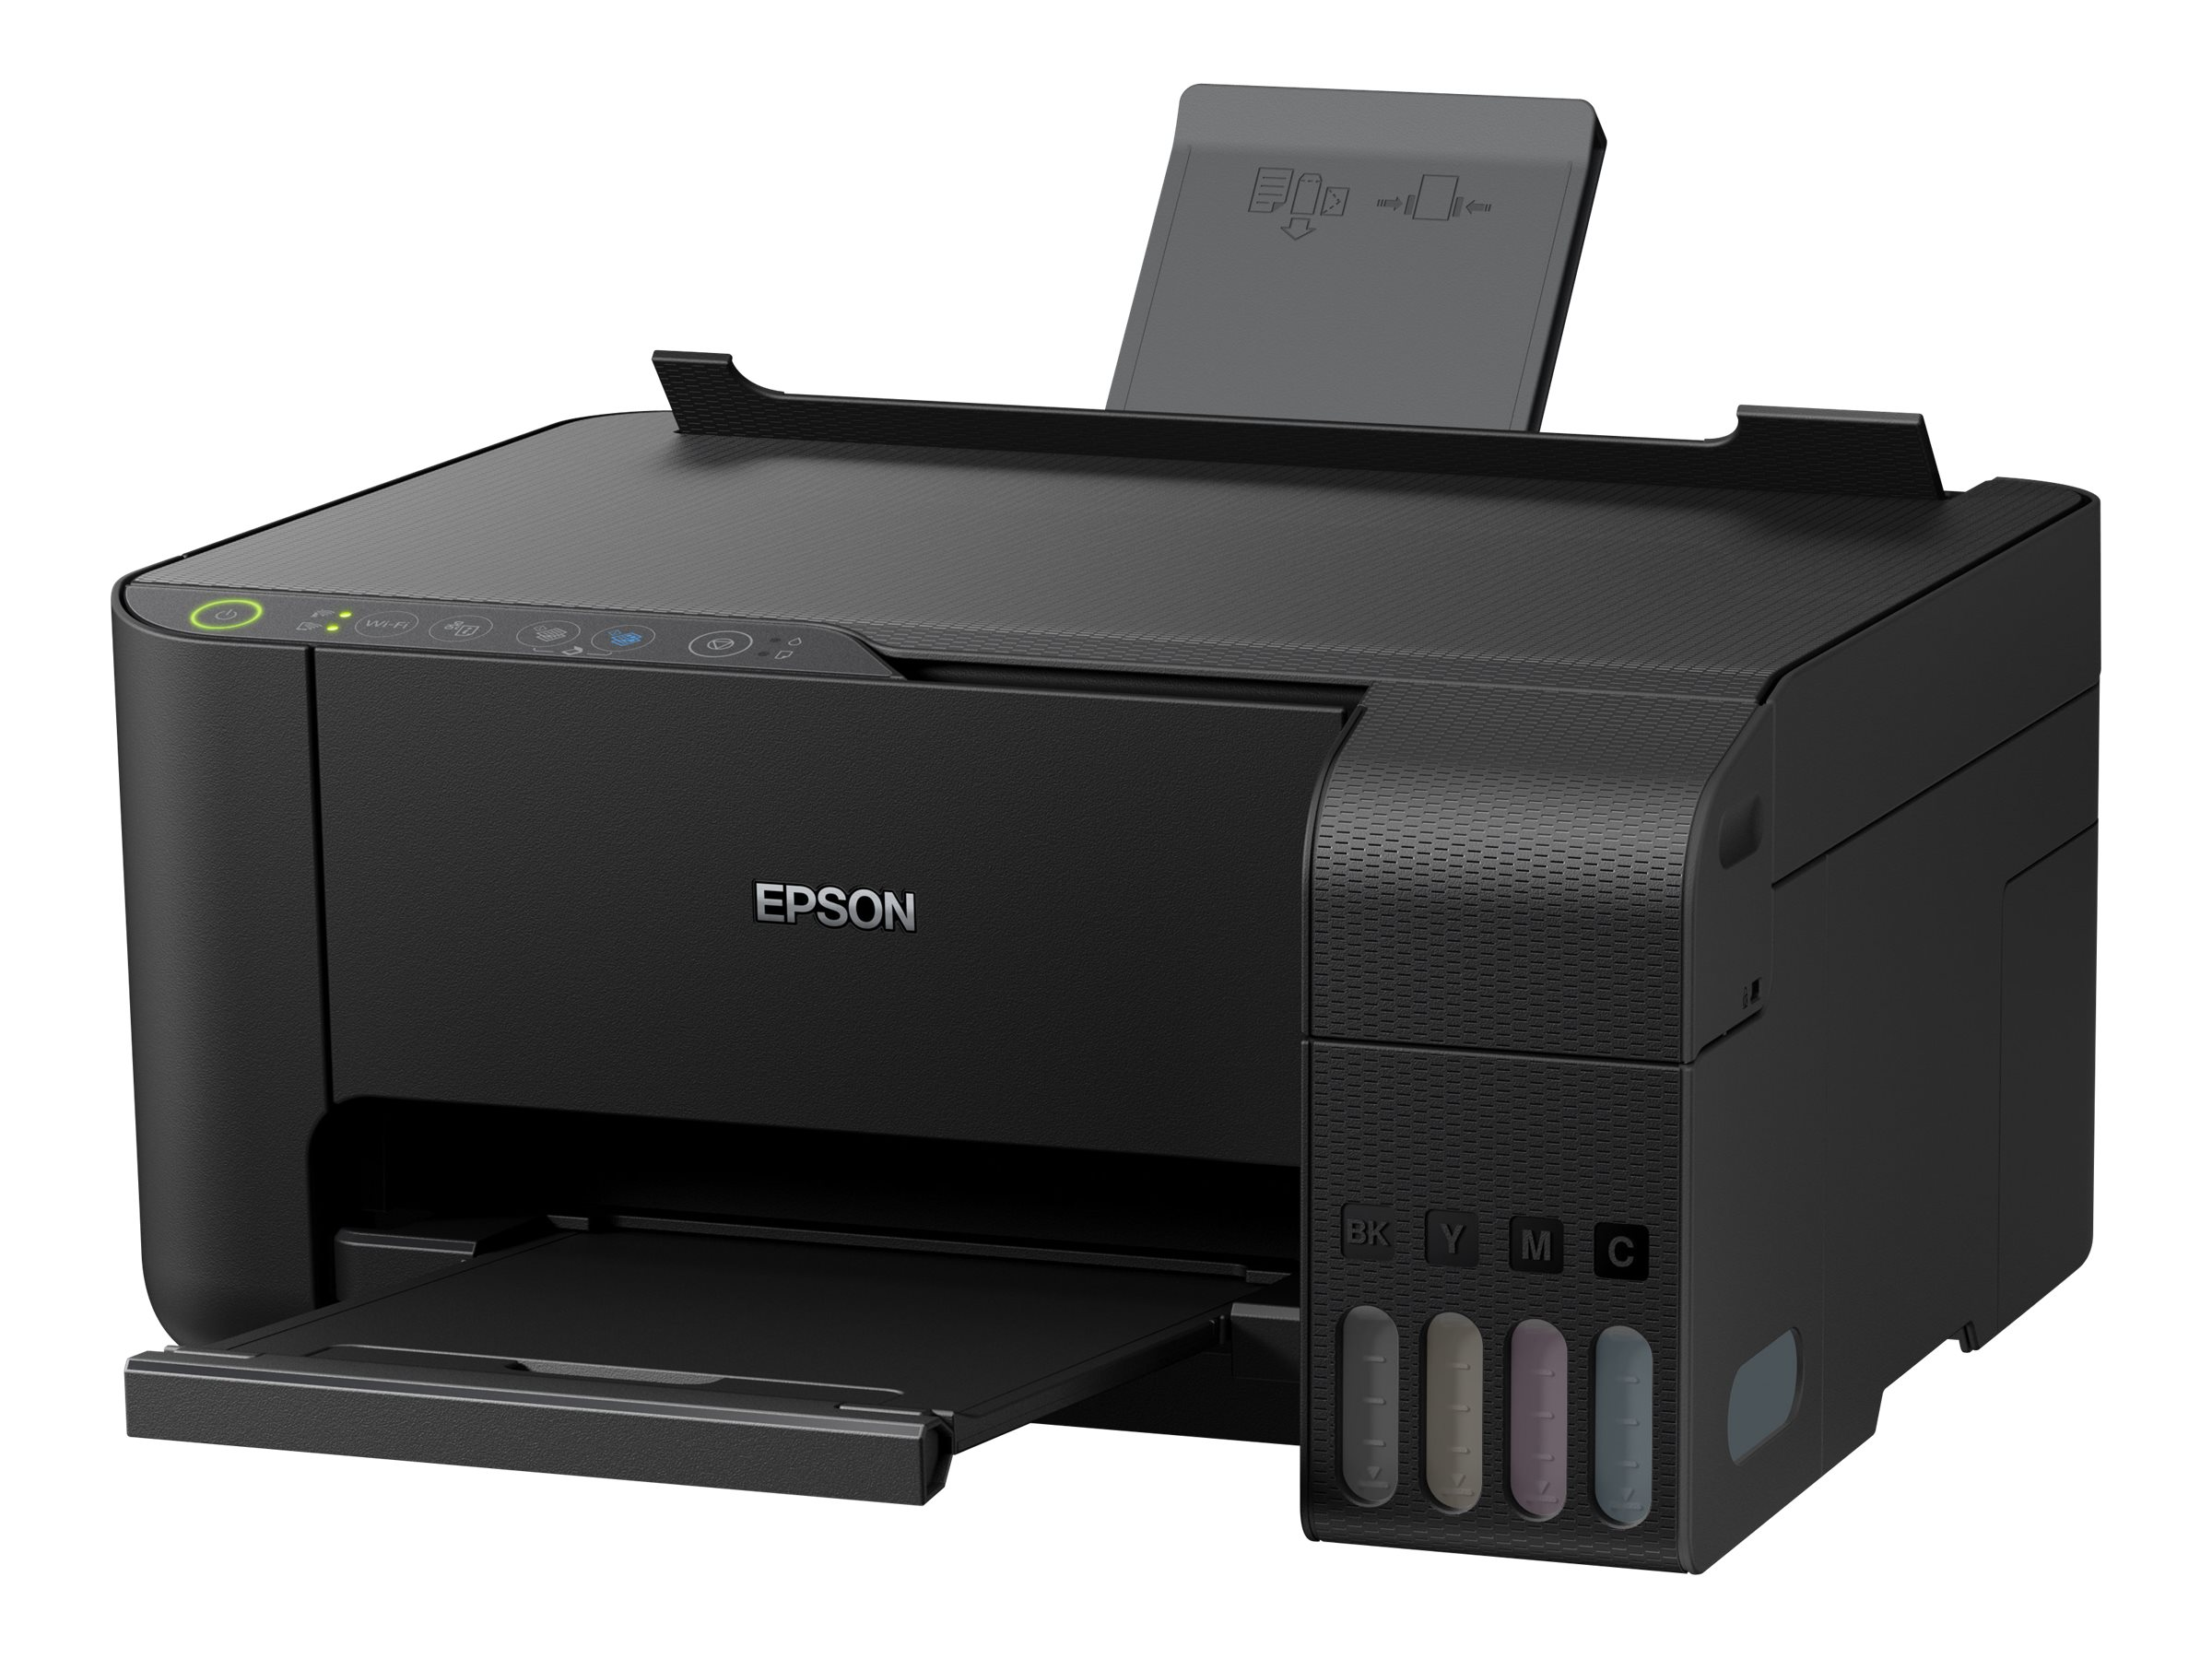 Epson EcoTank ET-2710 - Multifunktionsdrucker - Farbe - Tintenstrahl - refillable - A4/Legal (Medien)